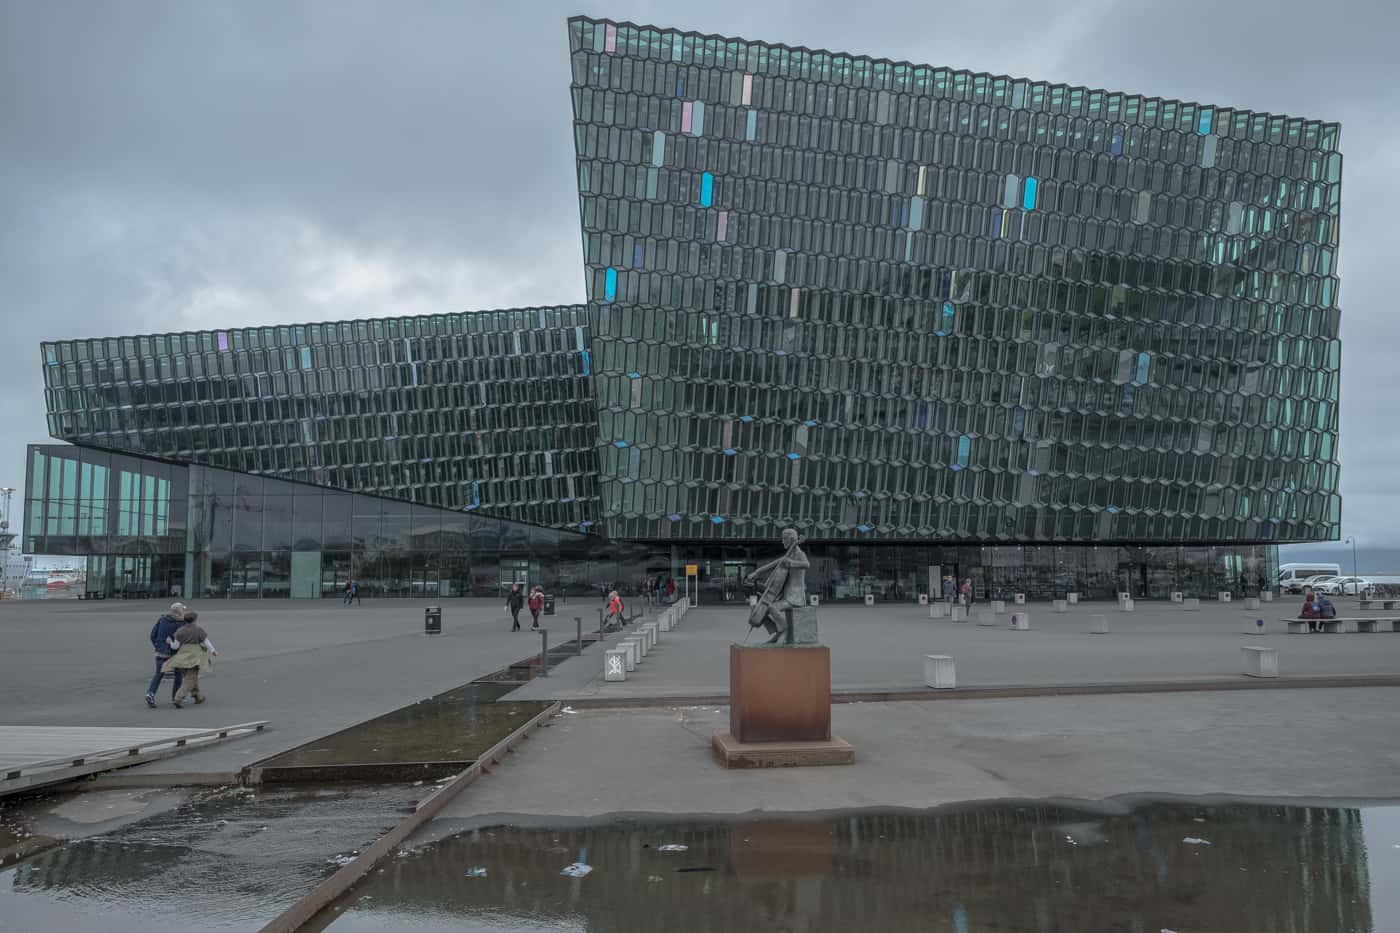 concert hall harpa iceland-5153